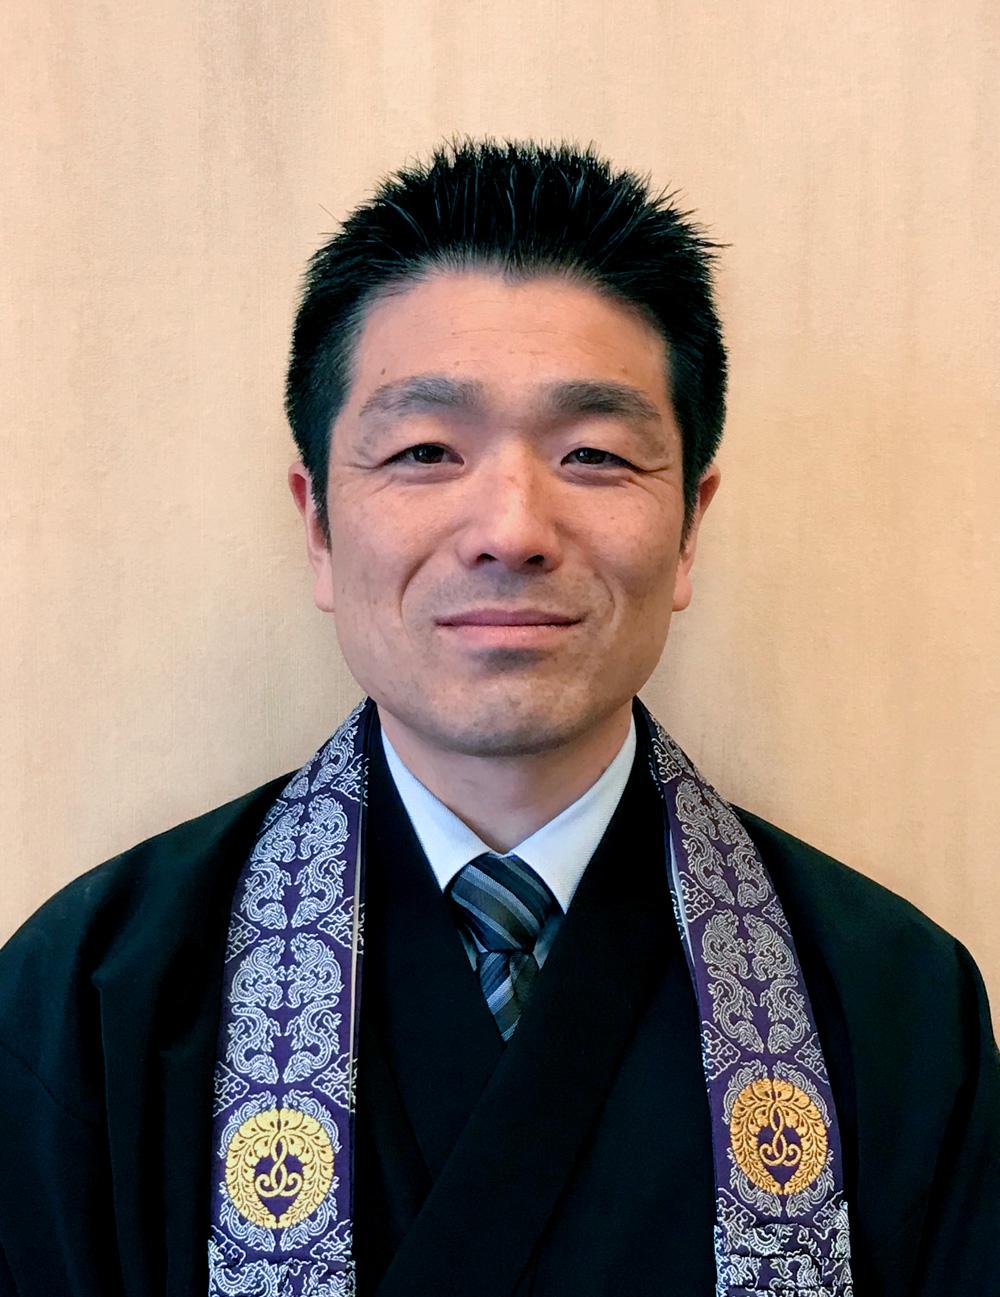 BBT_MinisterKuwahara.jpg